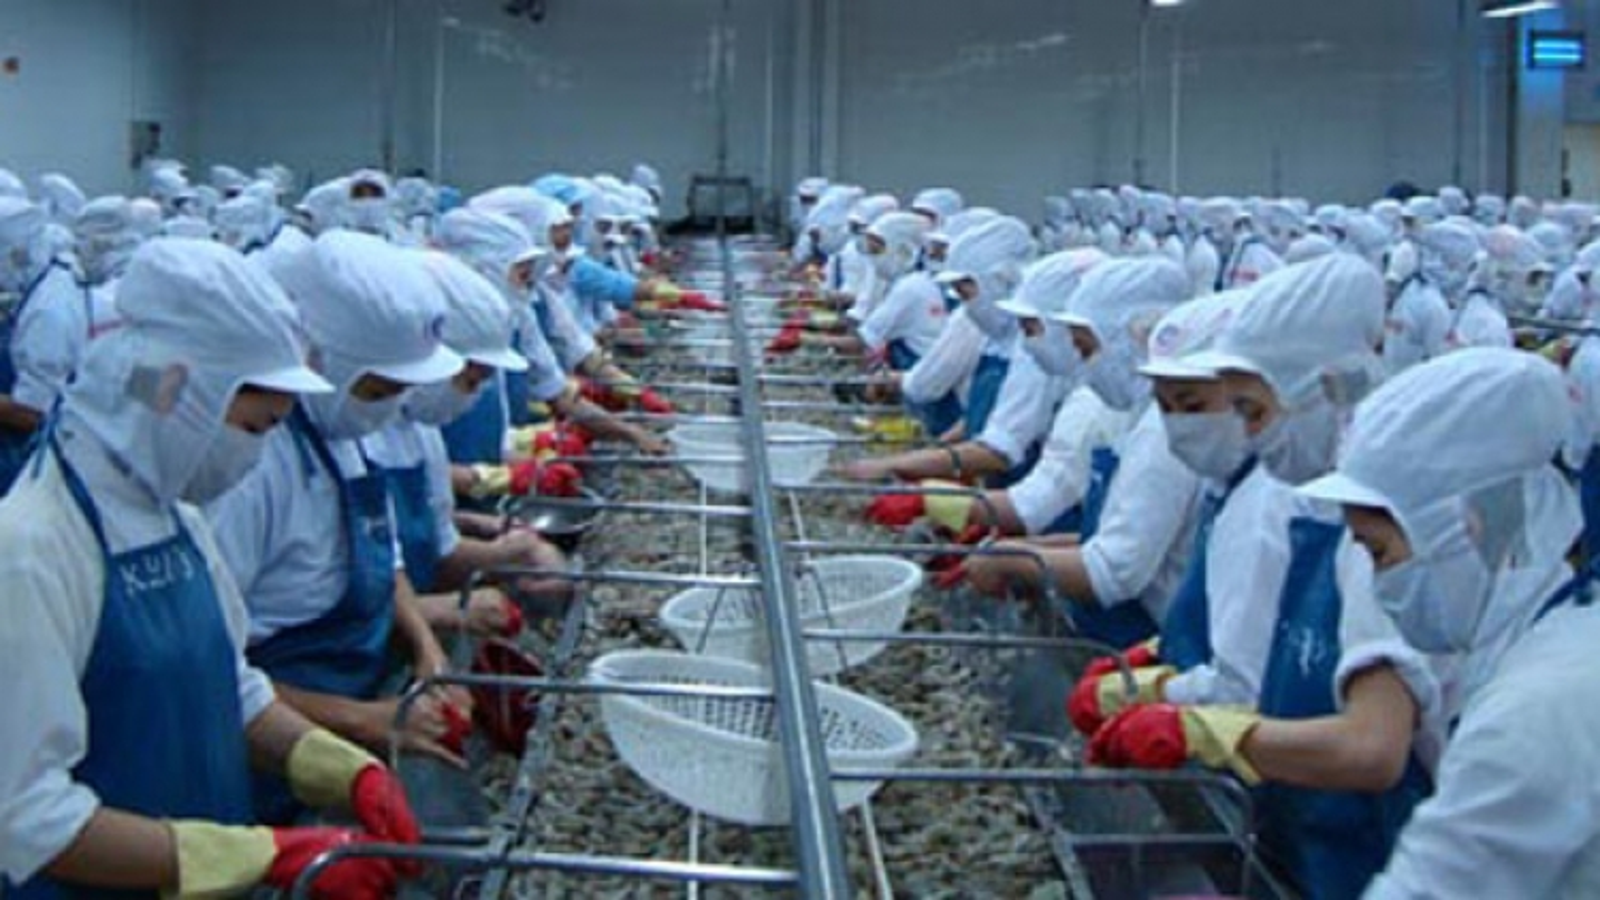 June shrimp exports to US slide, cloud economic outlook